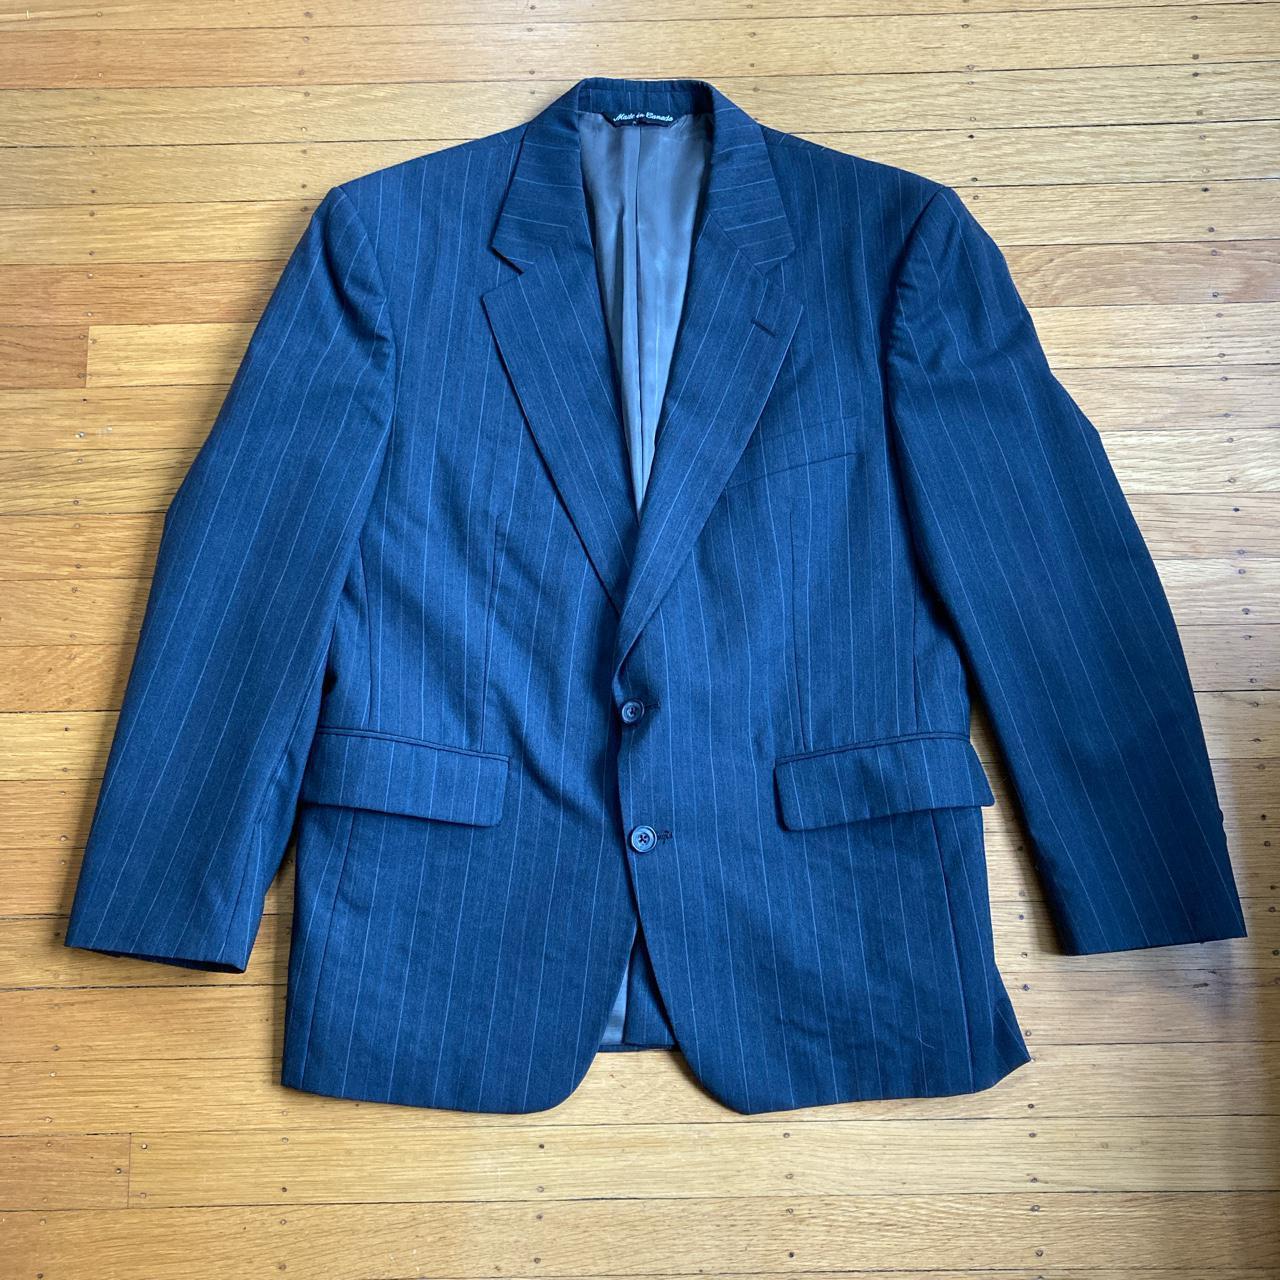 Product Image 1 - vintage aquascutum grey pinstriped suit